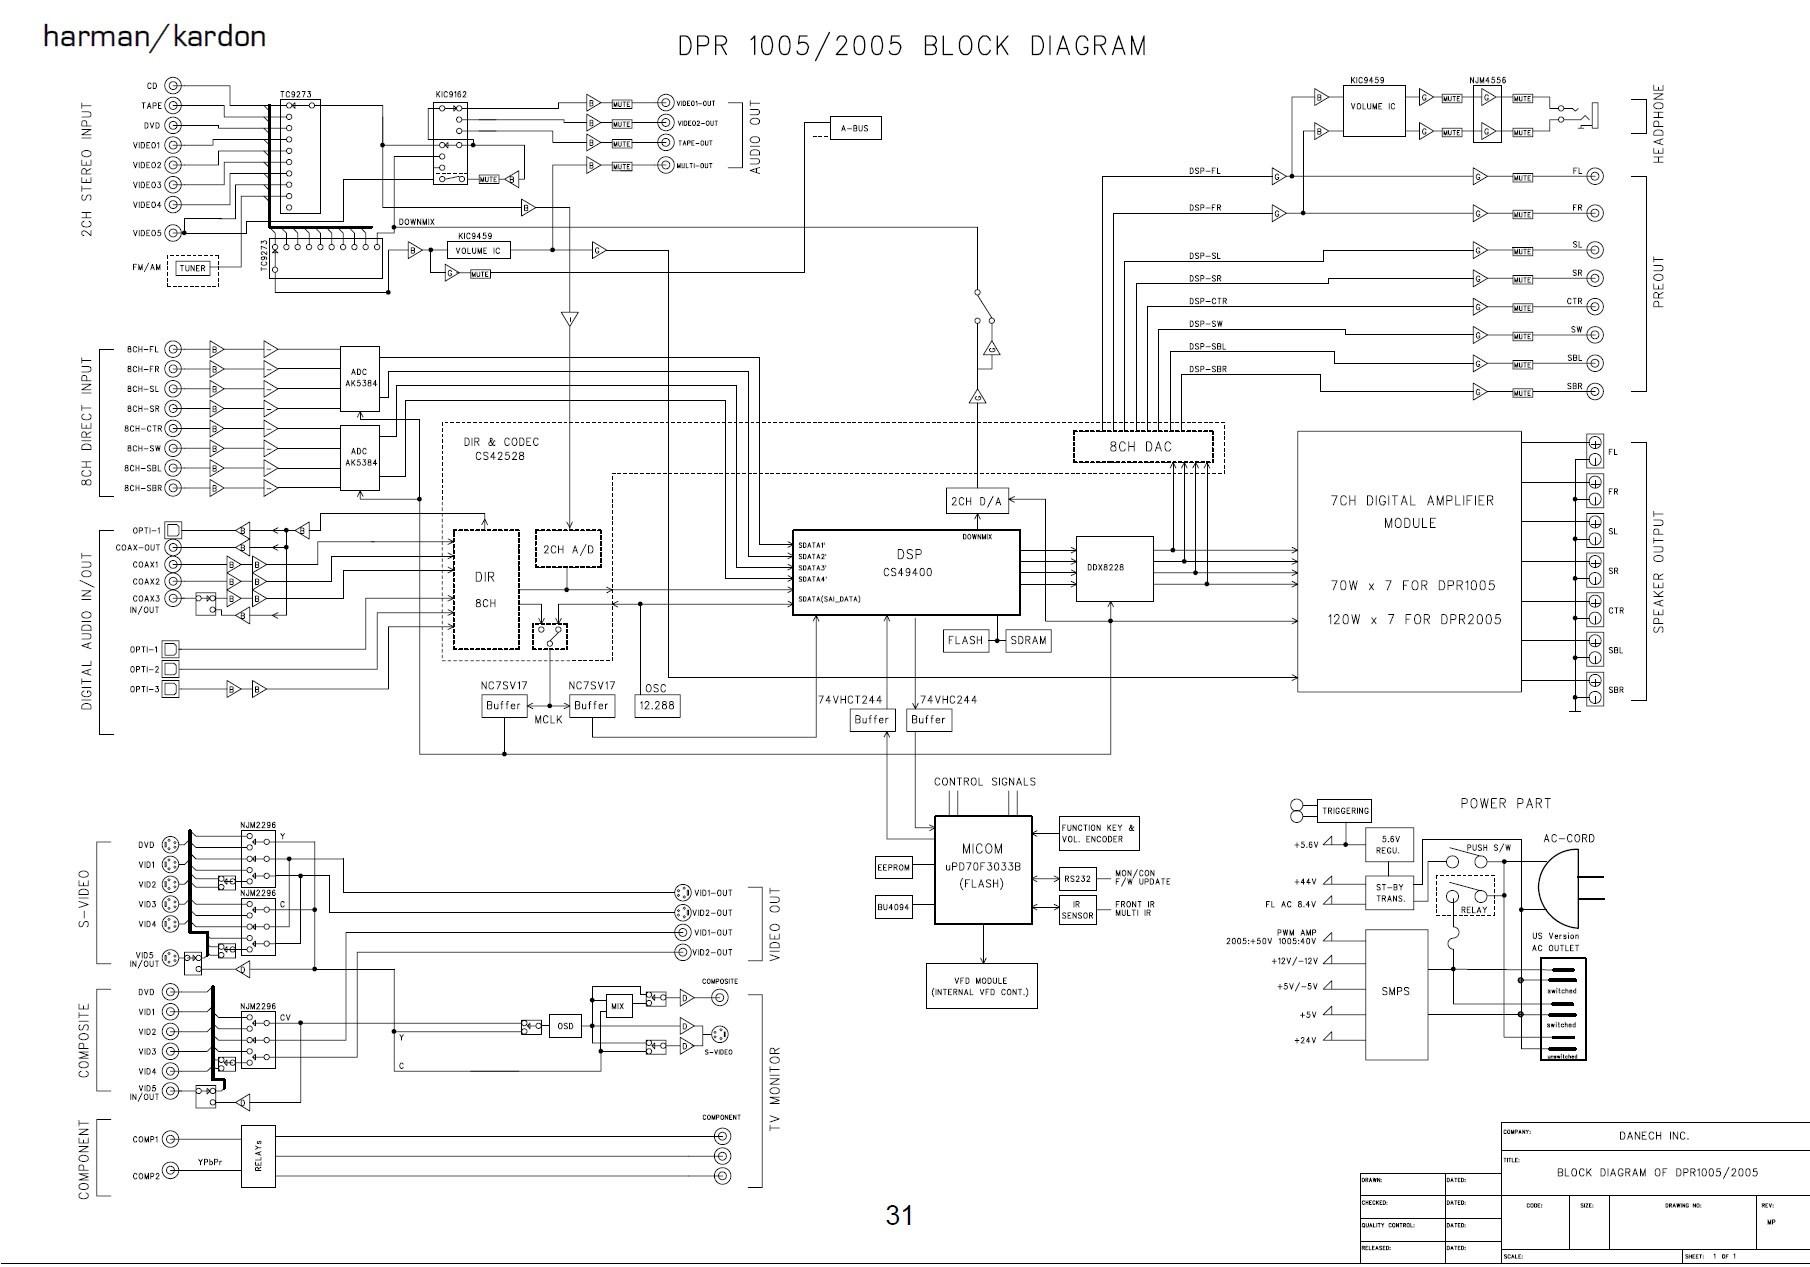 Harman Kardon Dpr 1500 Dpr 2500 Block Diagram